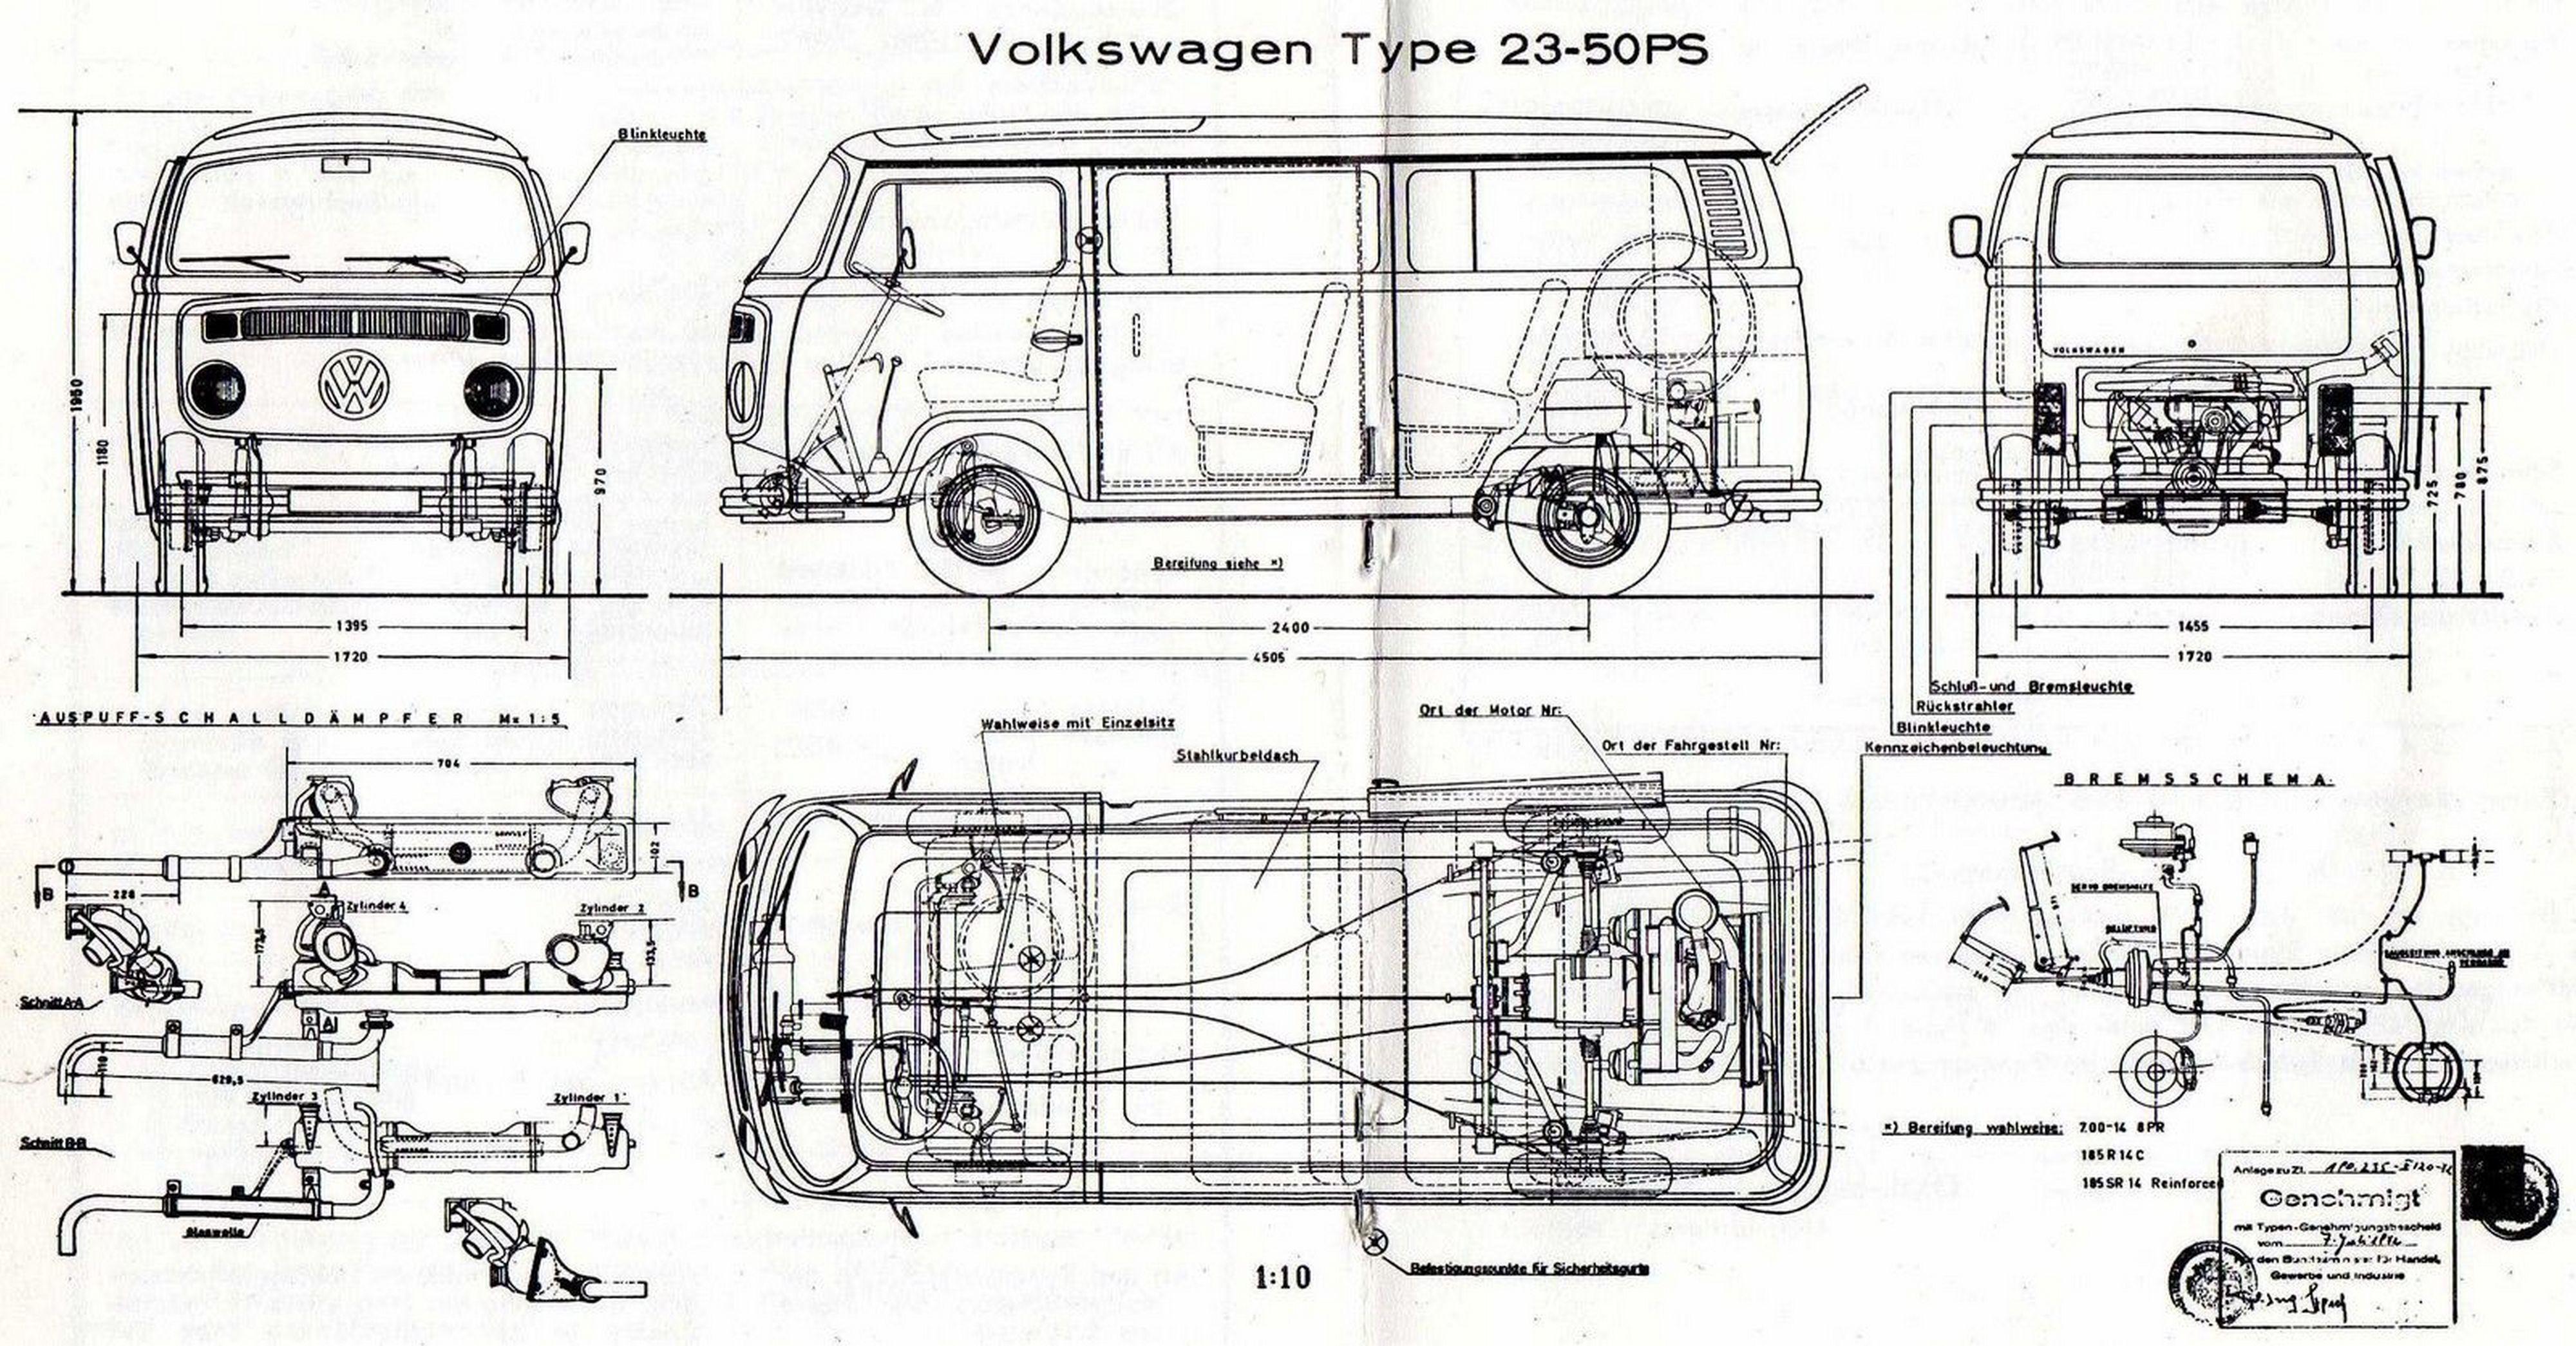 vw t2 bus type 23 1974 smcars net car blueprints. Black Bedroom Furniture Sets. Home Design Ideas